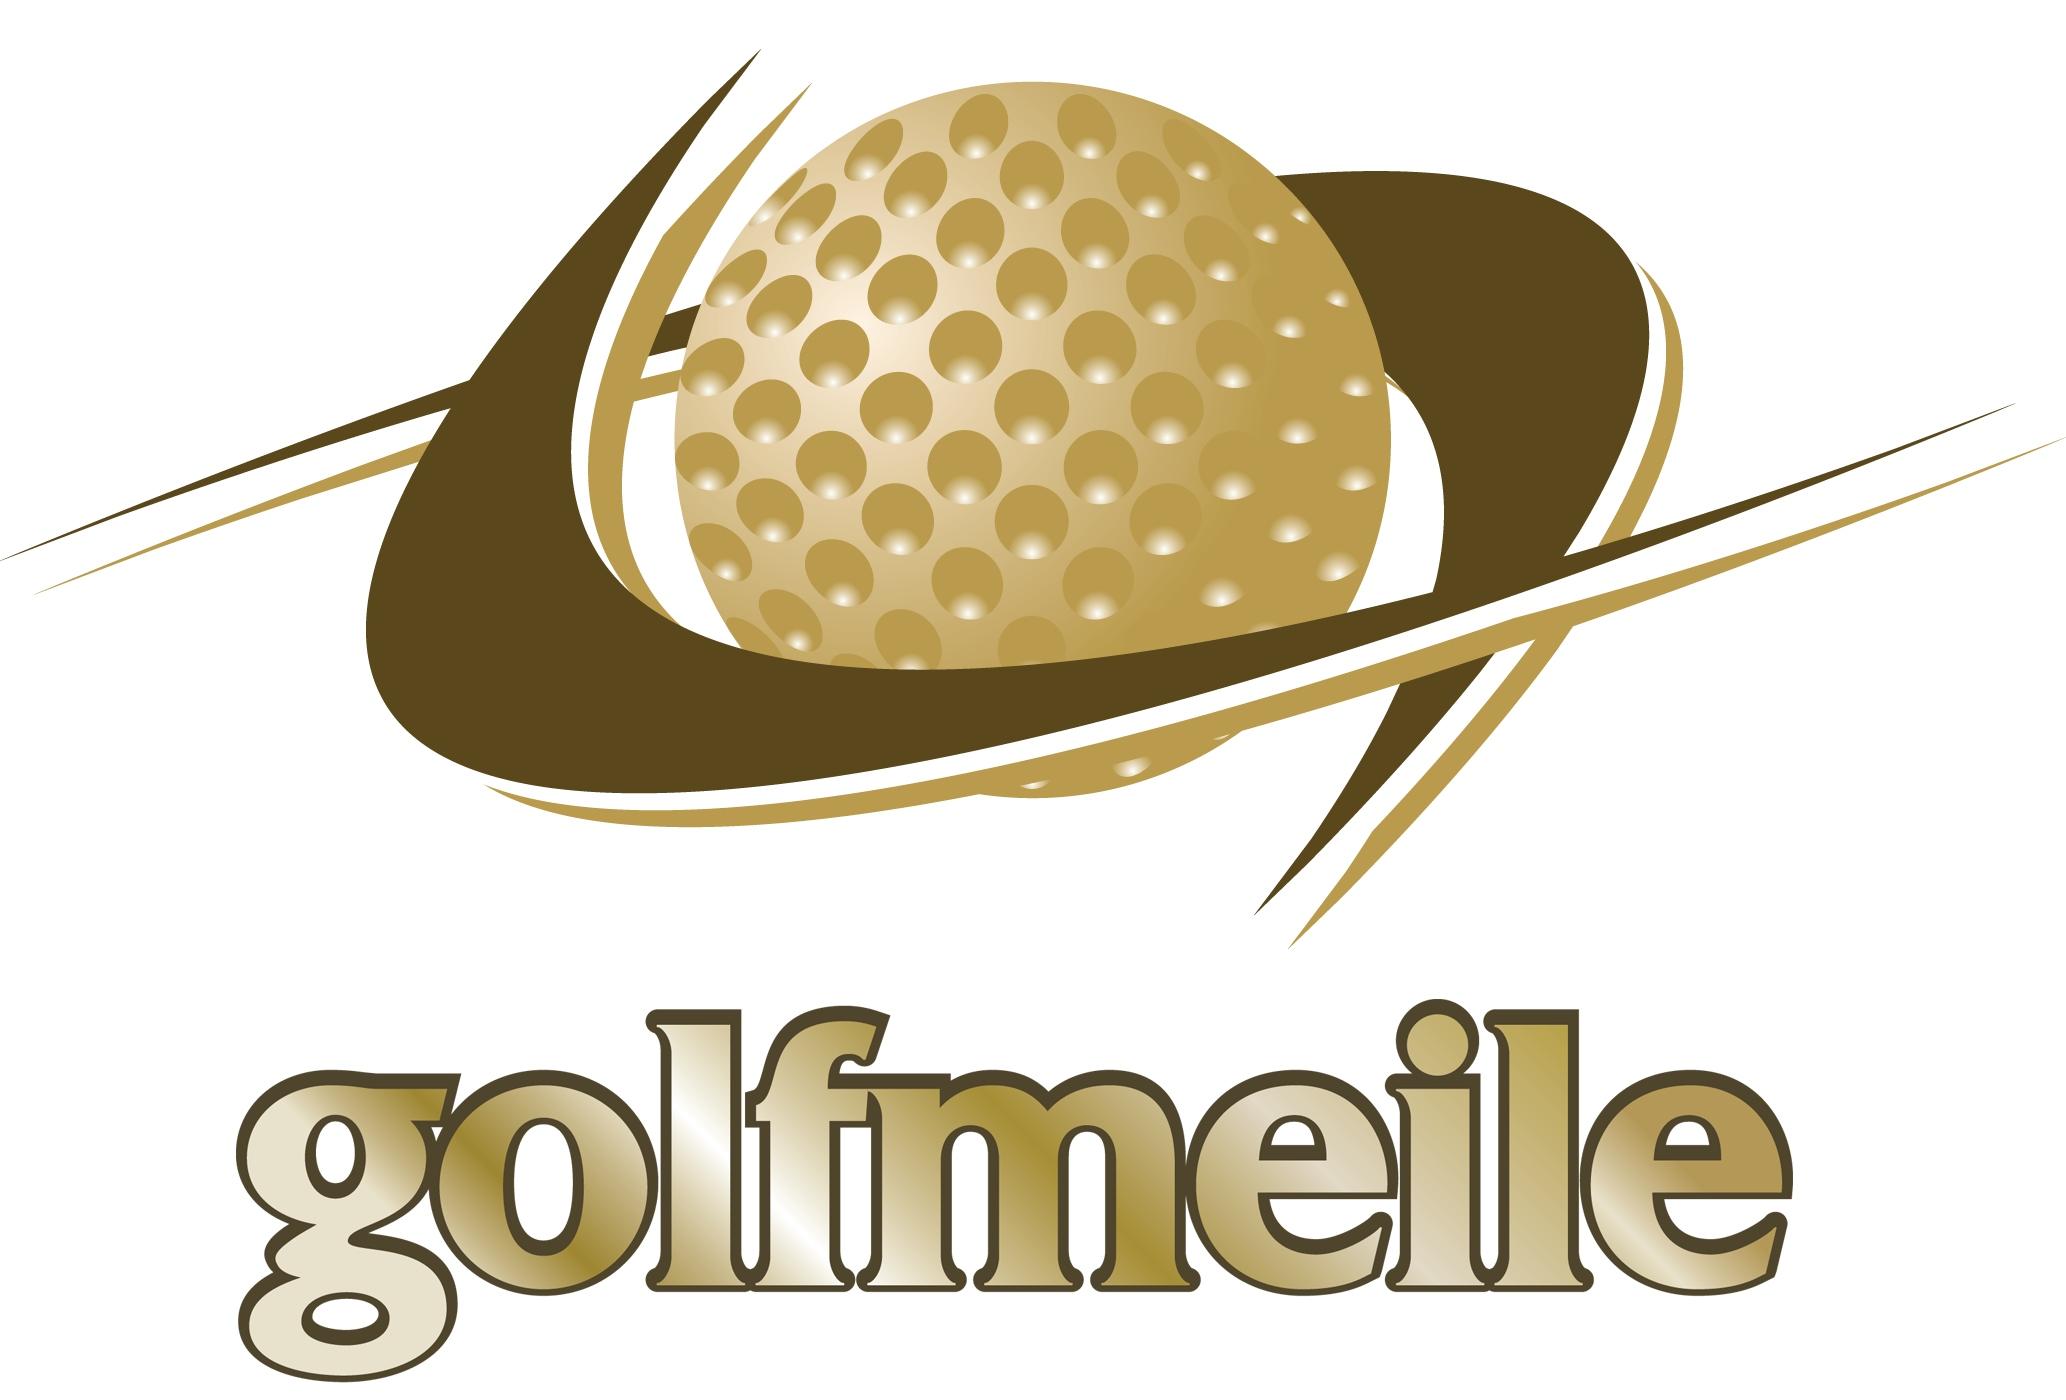 Navika - Crystal Golf Ball Marker 19745183edd0